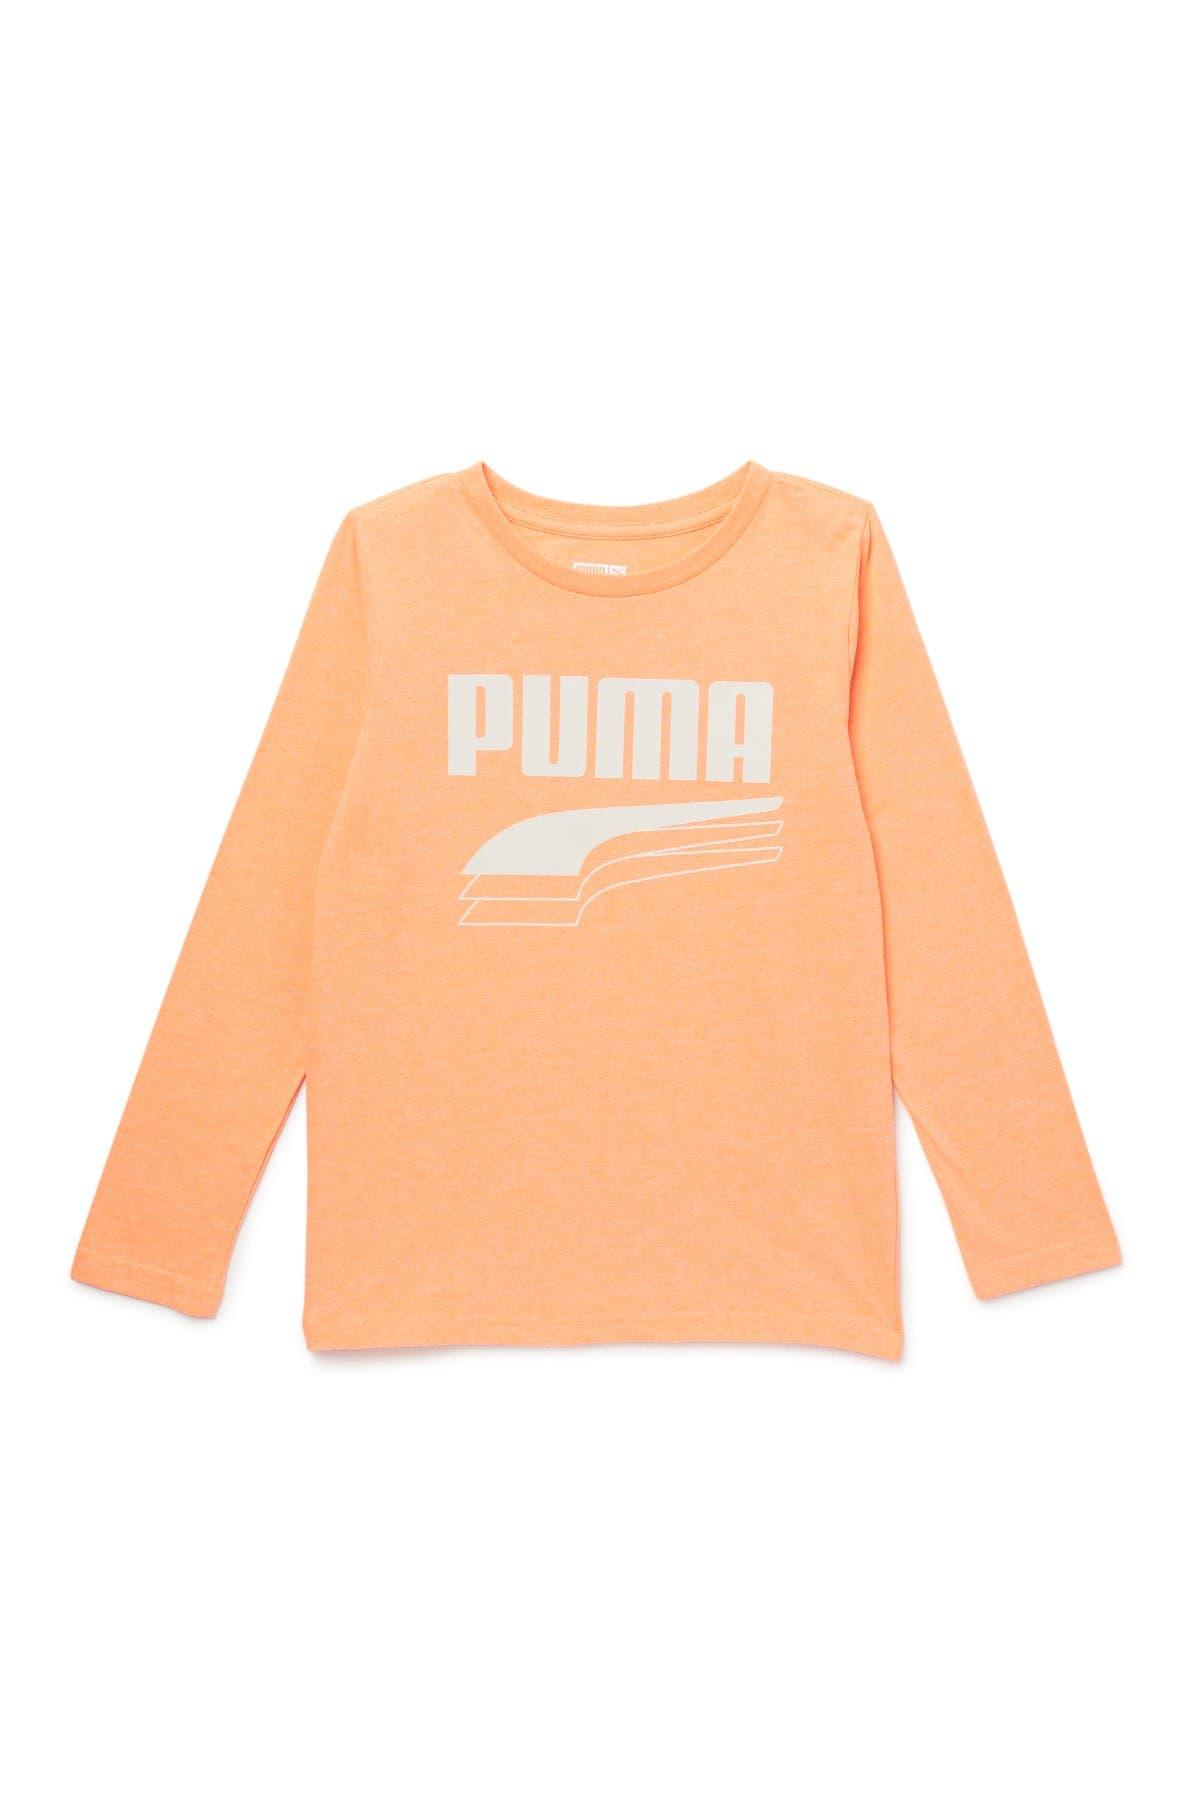 Image of PUMA Rebel Block Long Sleeve T-Shirt